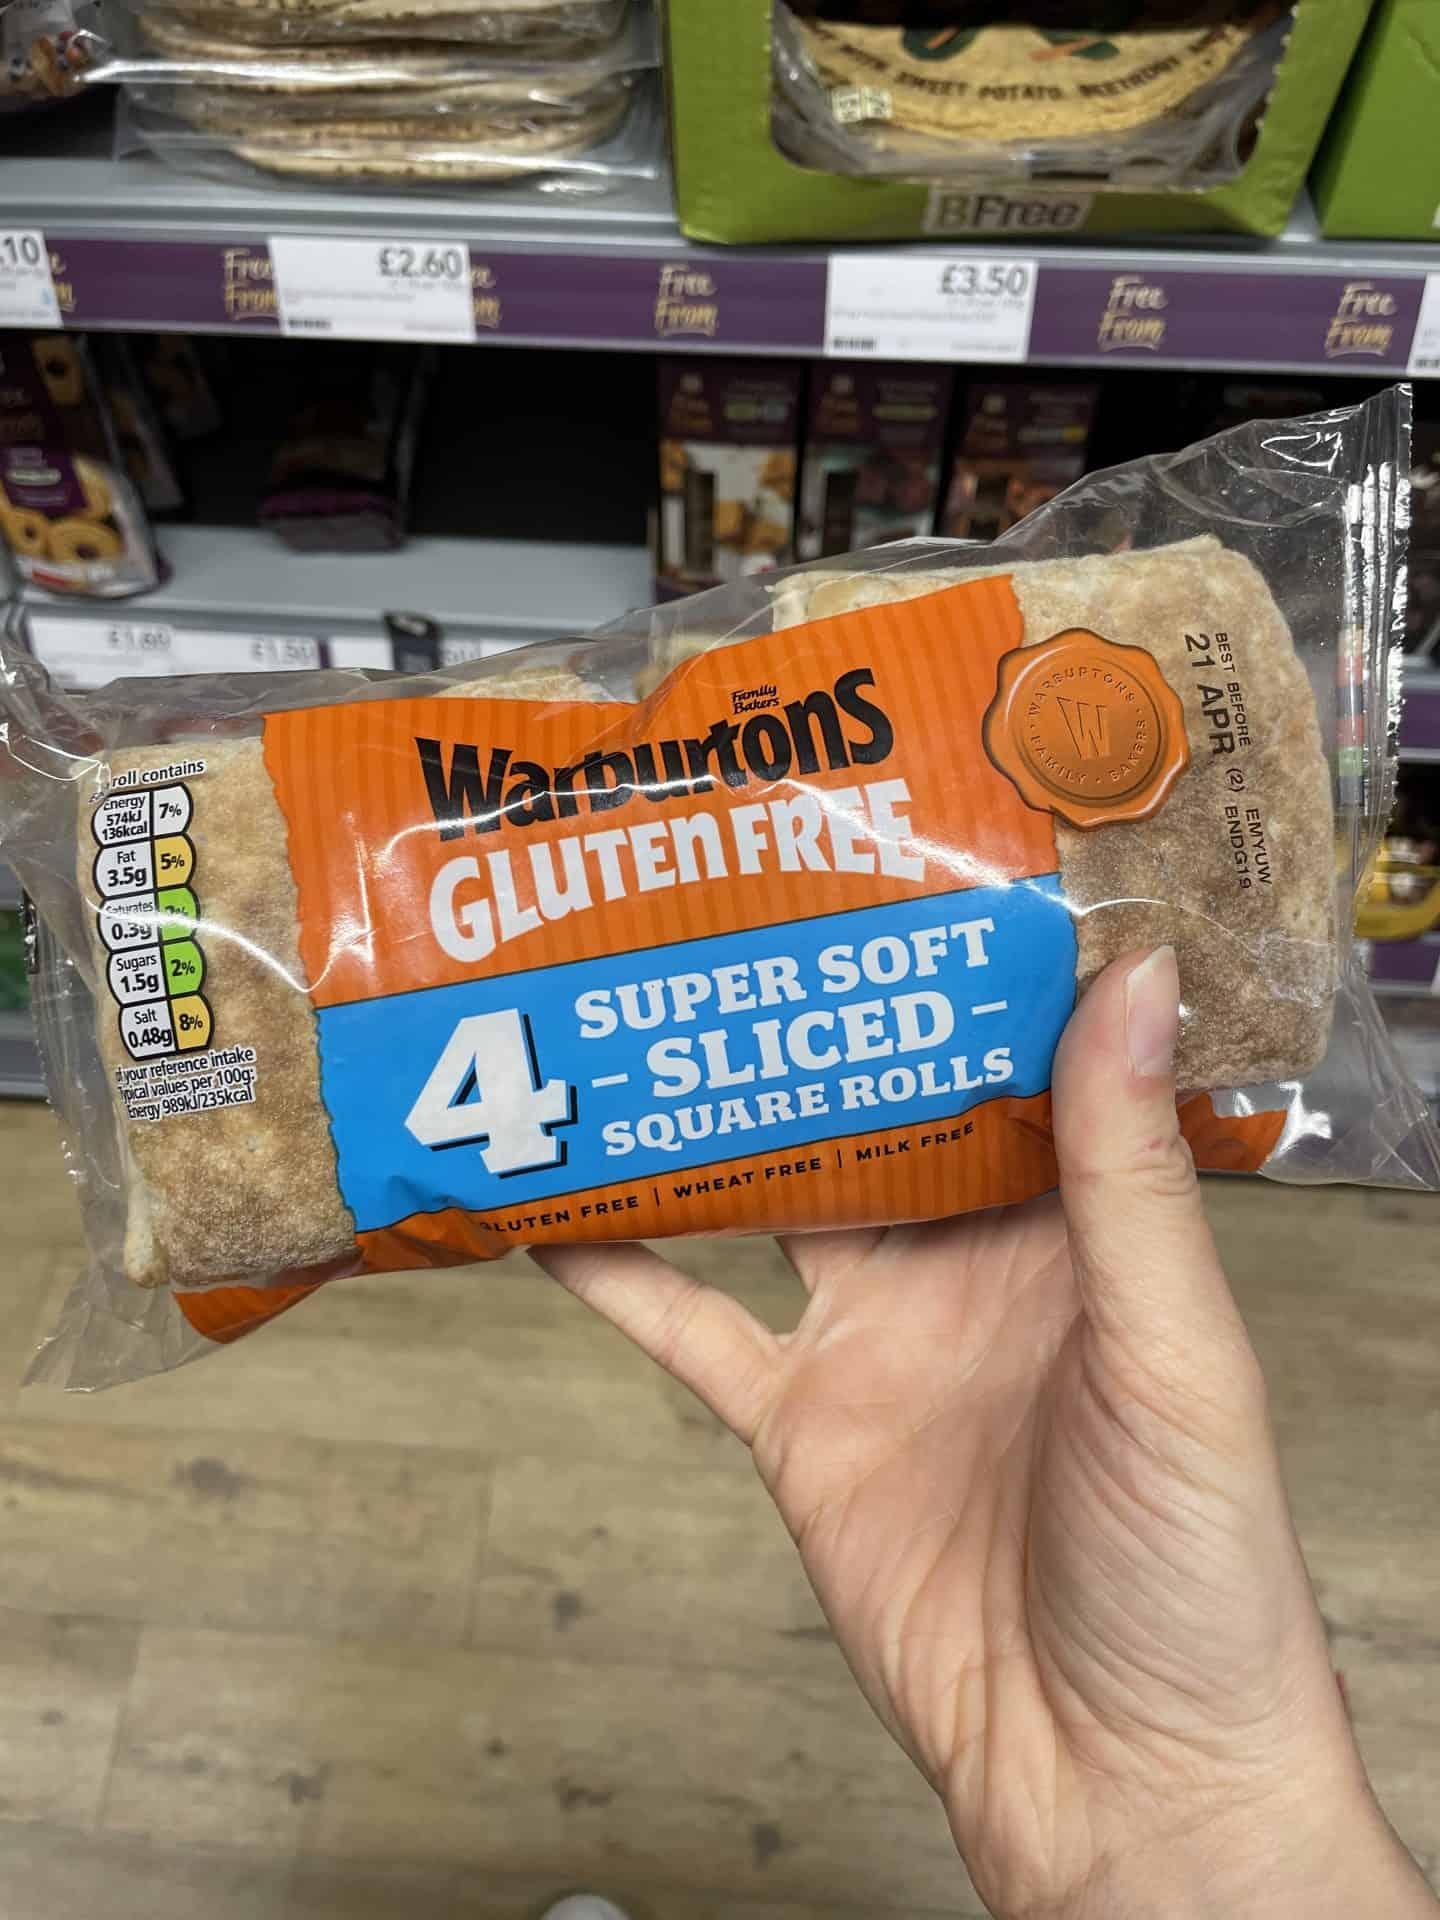 warburtons super soft square rolls